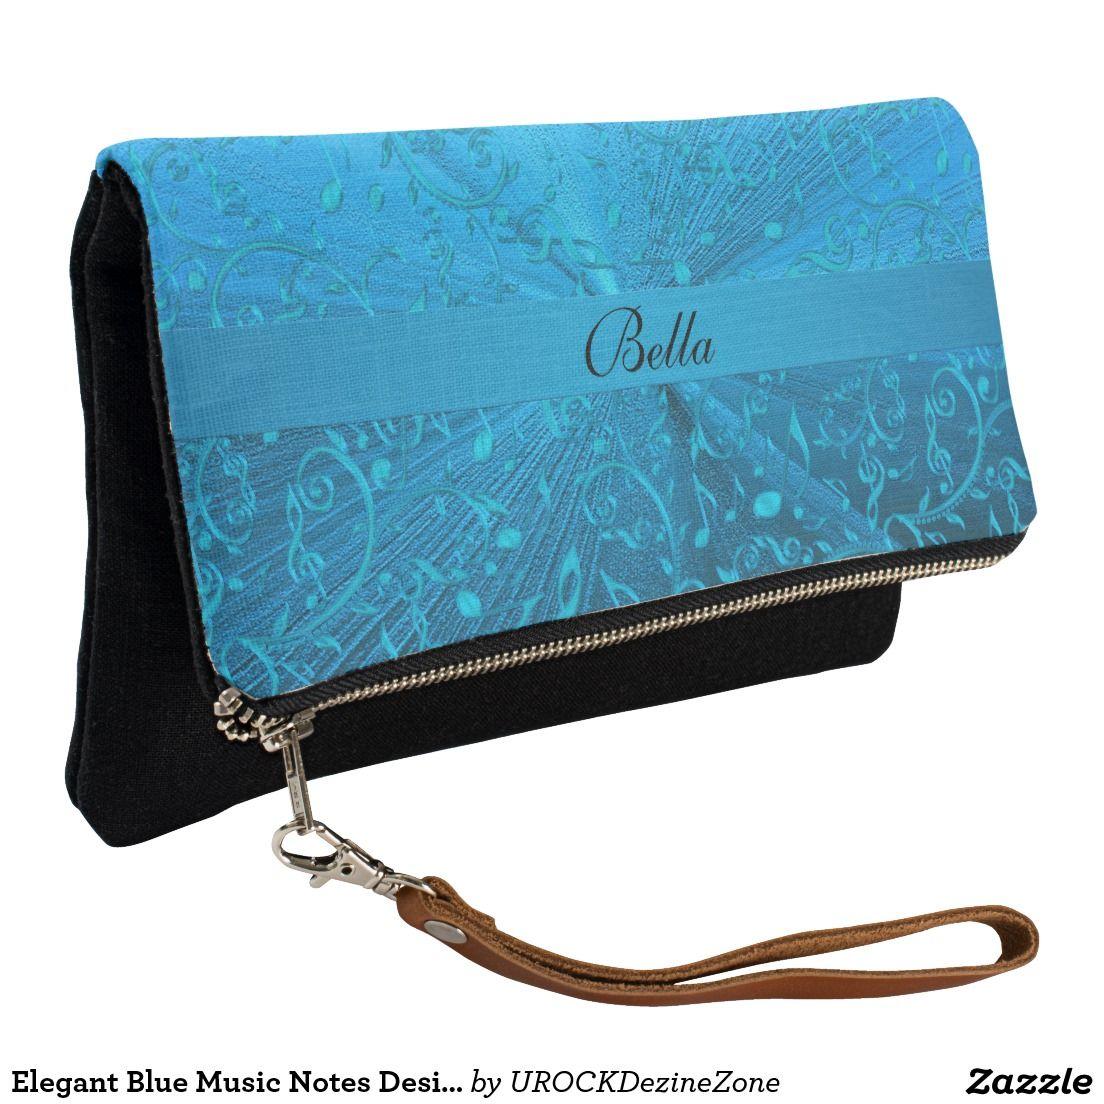 Elegant Blue #Music Notes Design #Clutch #Purse #Bag  #zazzle